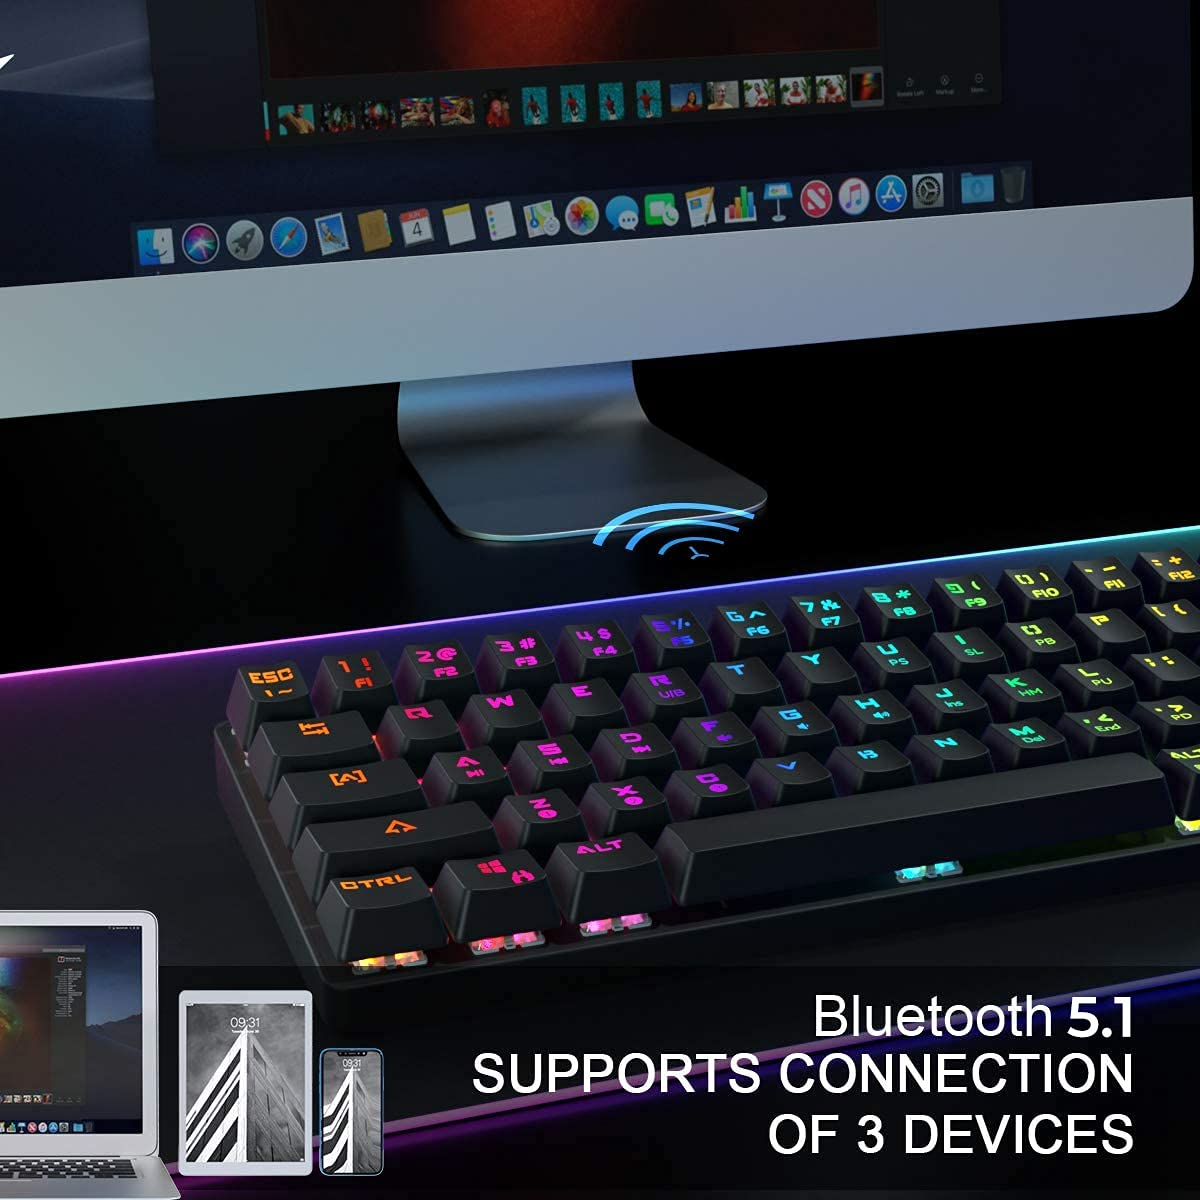 DIERYA DK63 60% Keyboard with Dedicated Arrow Keys, Wireless Wired Mechanical Gaming Computer Keyboard True RGB LED Backlit Bluetooth 5.1 Programmable, N-Key Rollover for Windows and Mac- Blue Switch